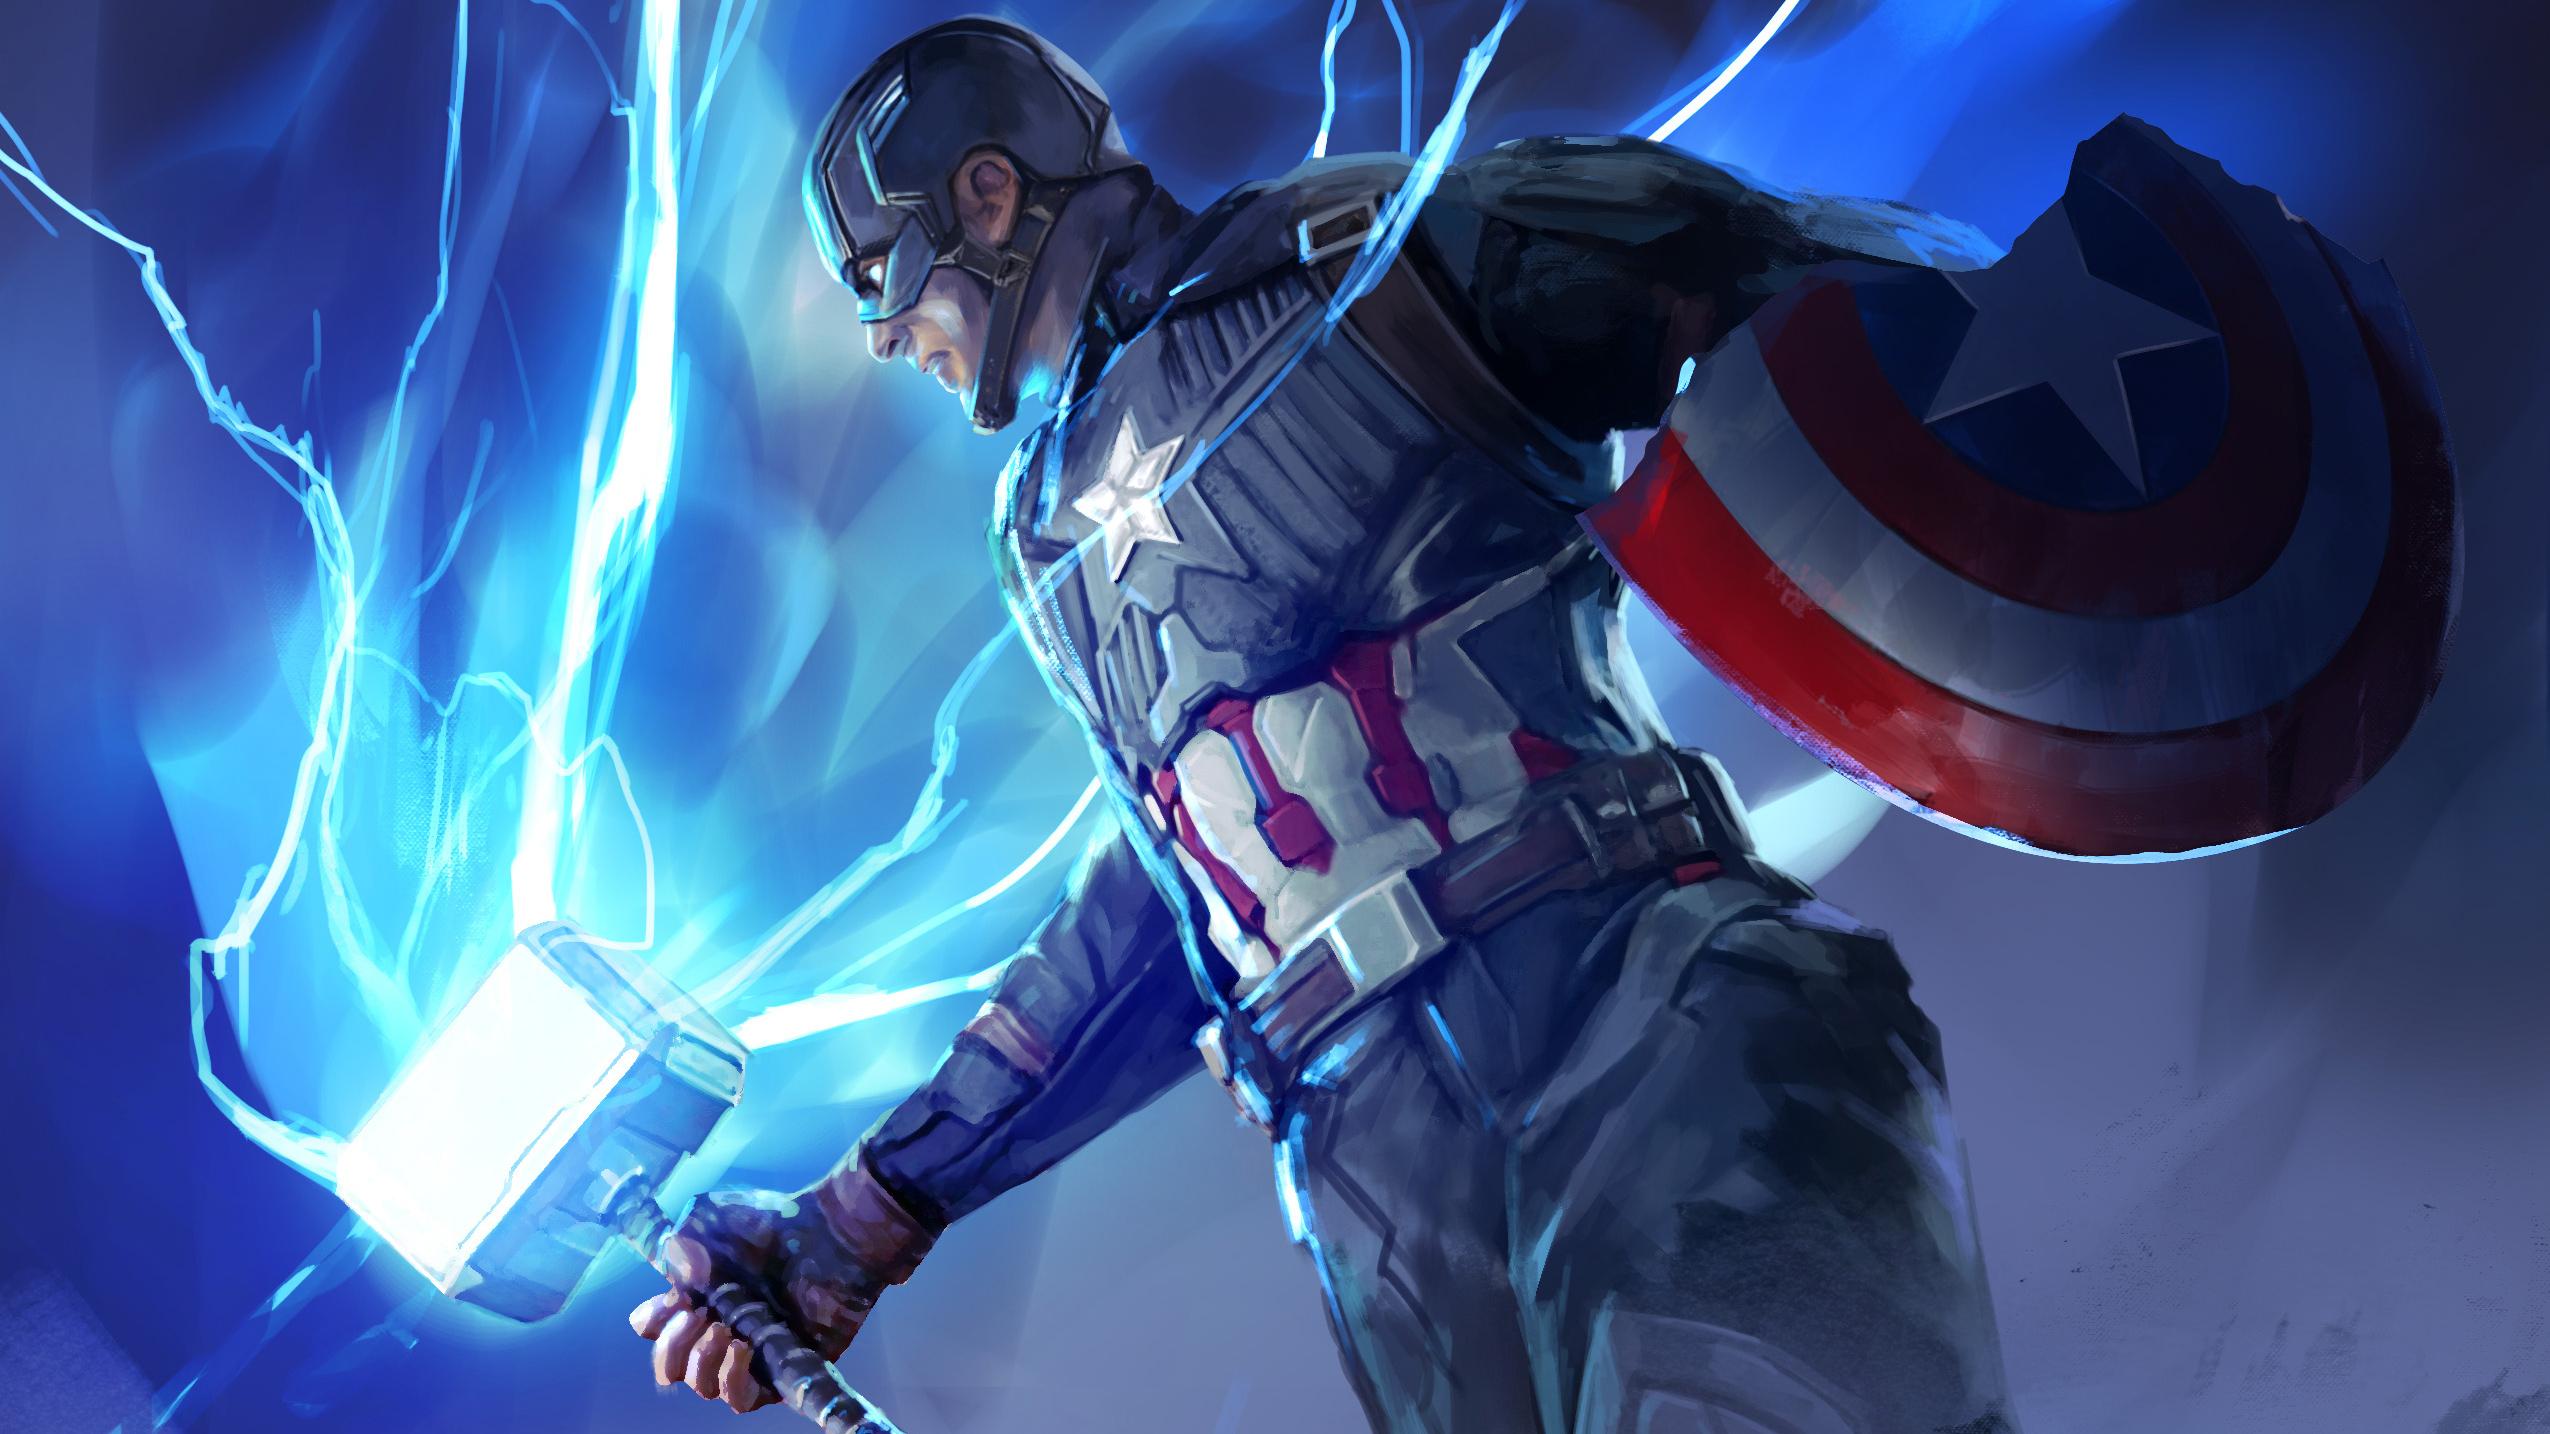 New Captain America Avengers Endgame, HD Superheroes, 4k ...